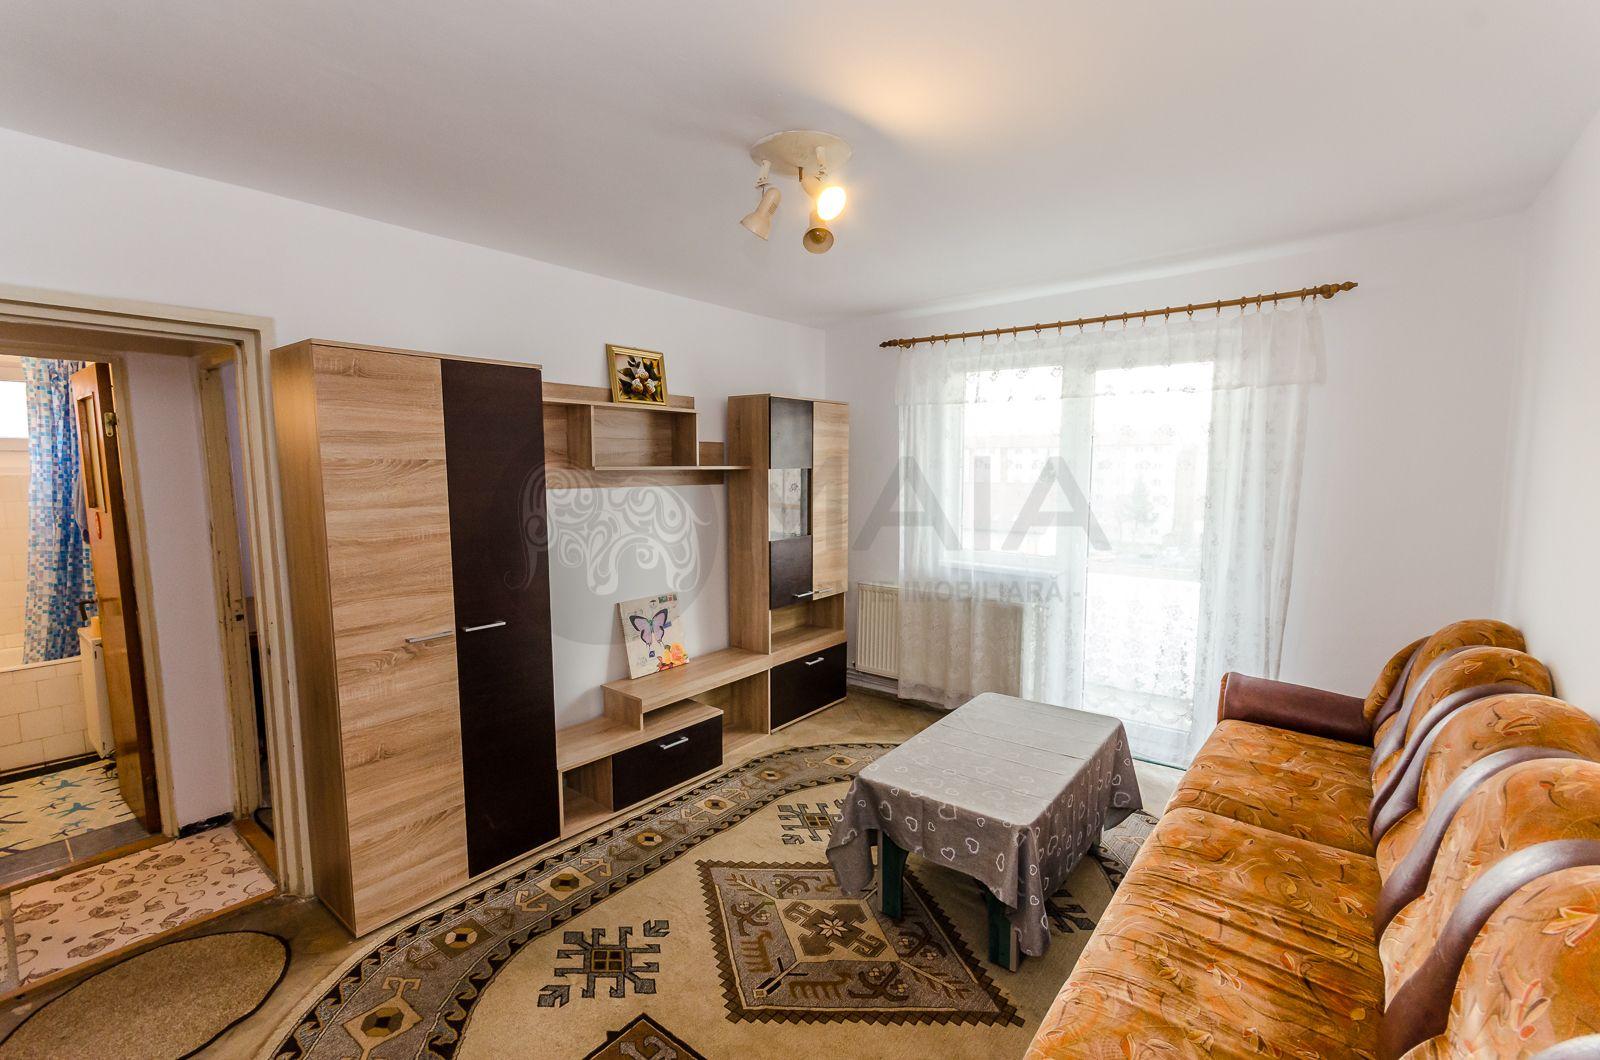 Apartament 2 camere sd, 48 mp, balcon, mobilat si utilat, zona Mihai Viteazu